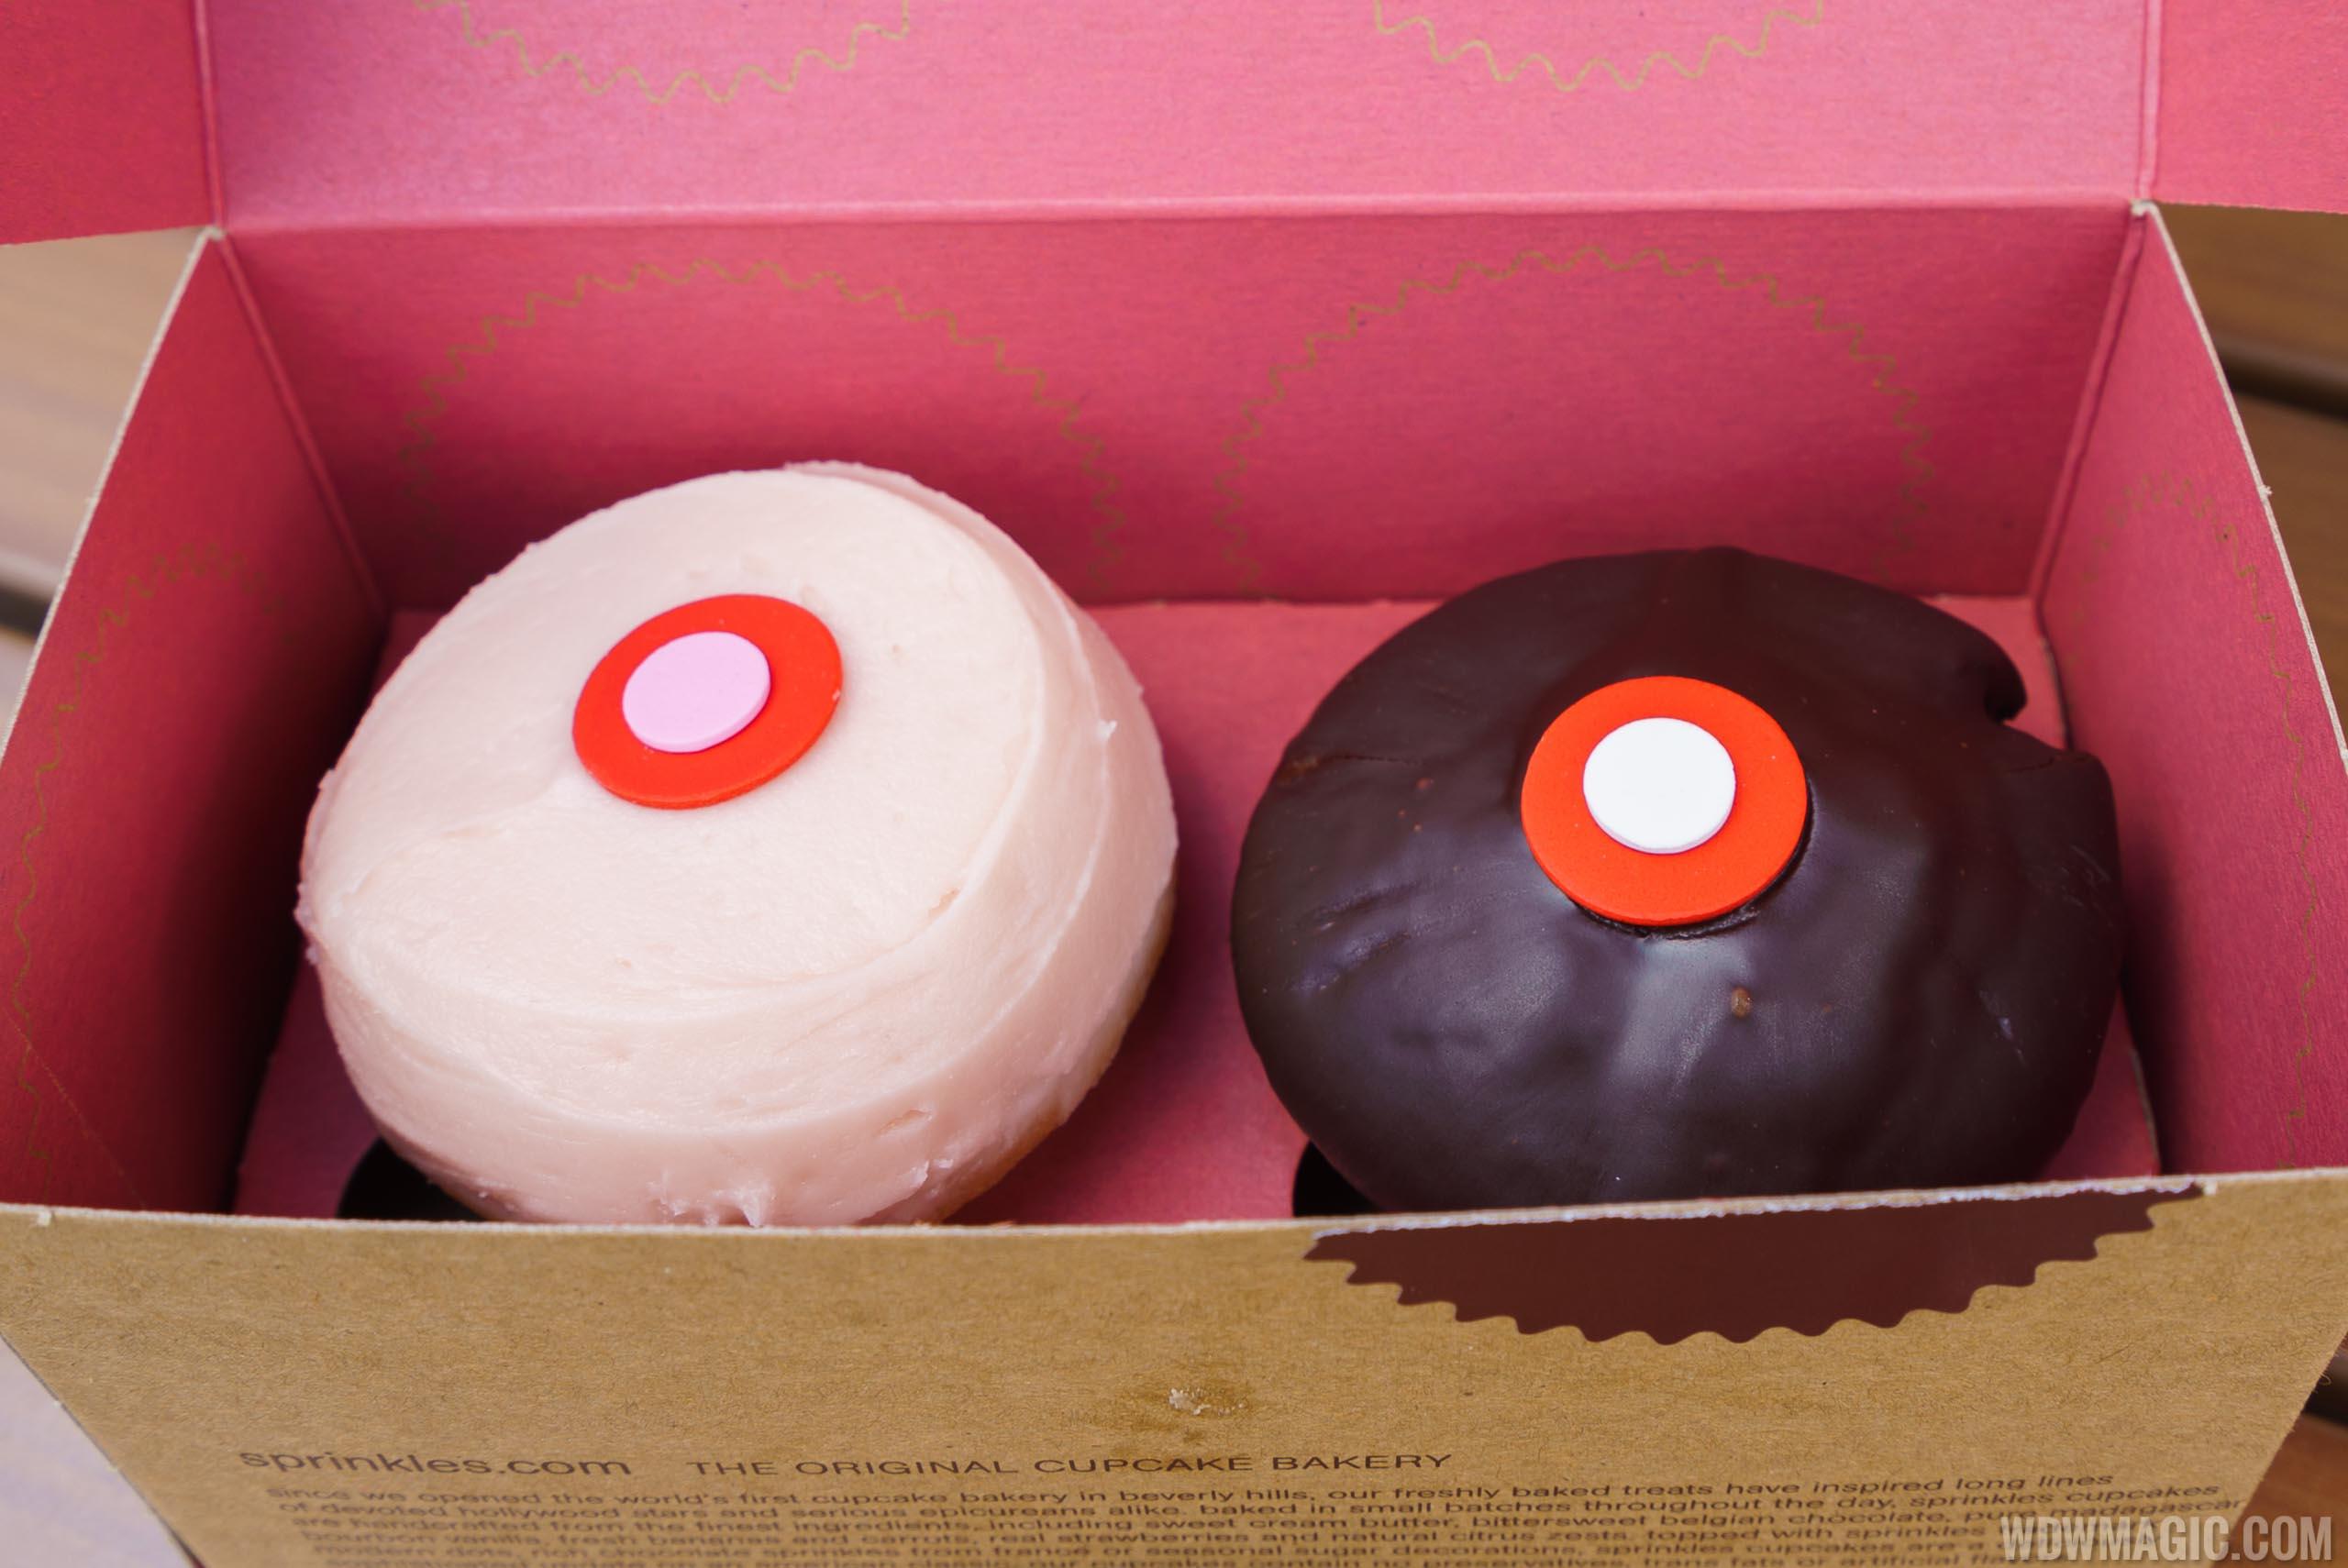 Two Sprinkles cupcakes